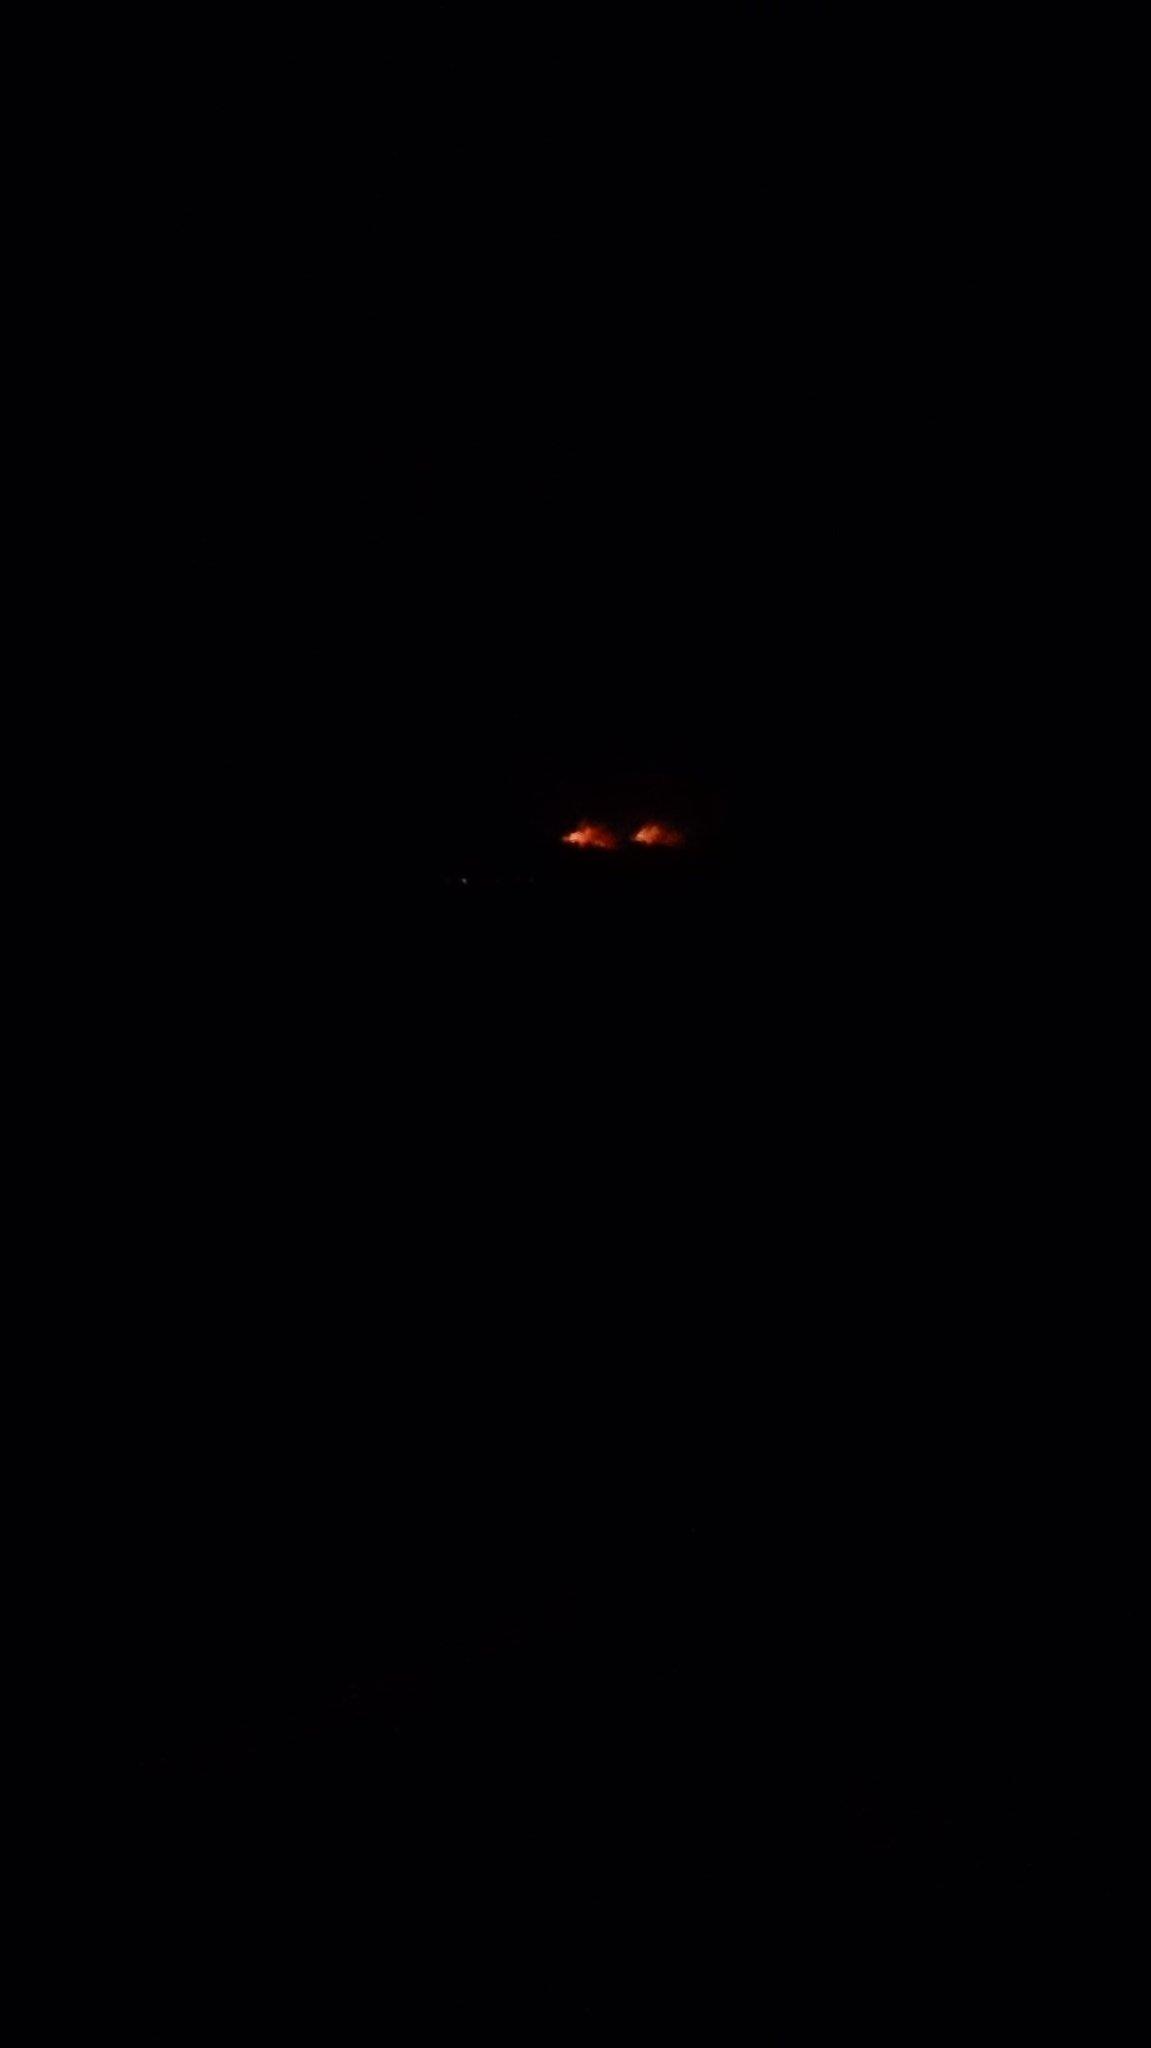 画像,土居町天満で林野火災発生中 https://t.co/rY03QwWhhl。